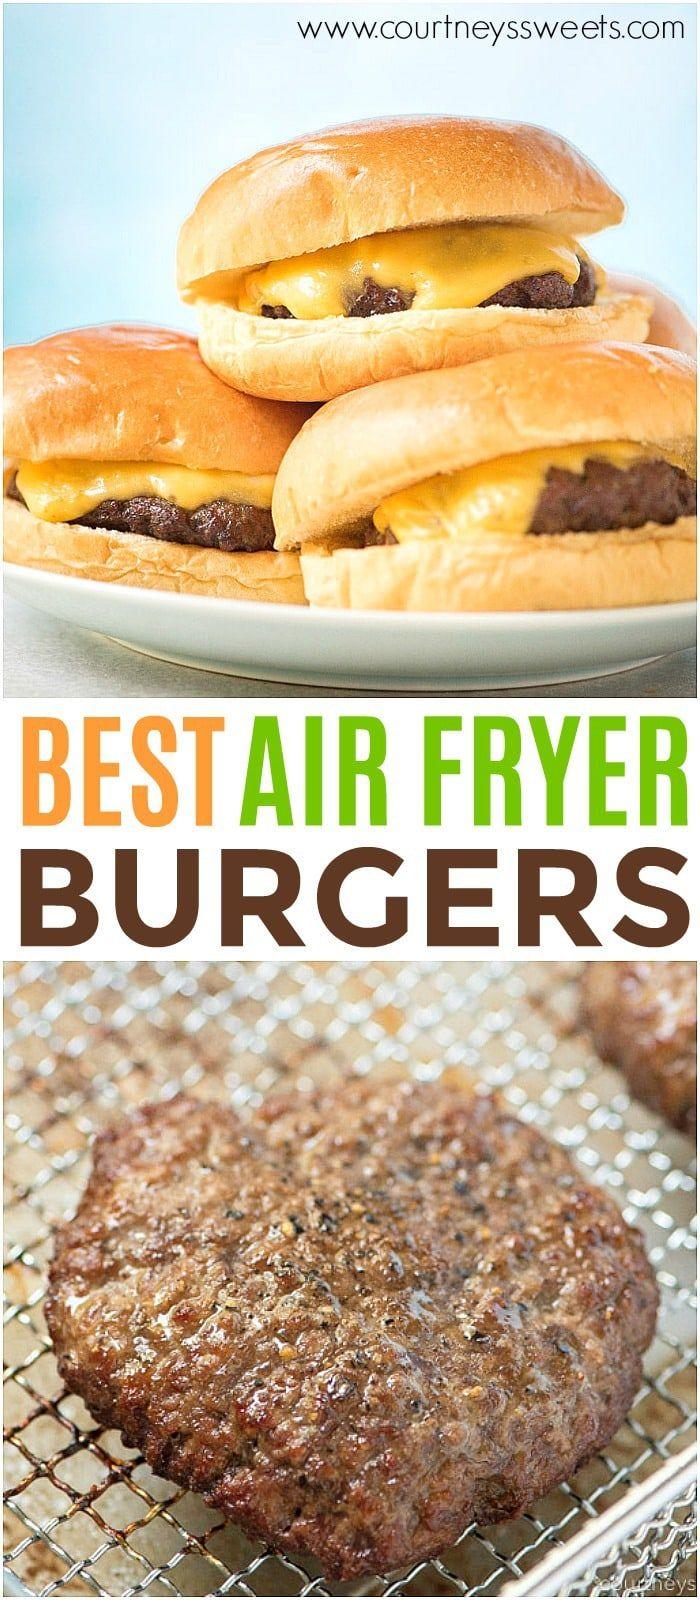 Airfried Burgers Recipe Air fryer recipes, Air fryer